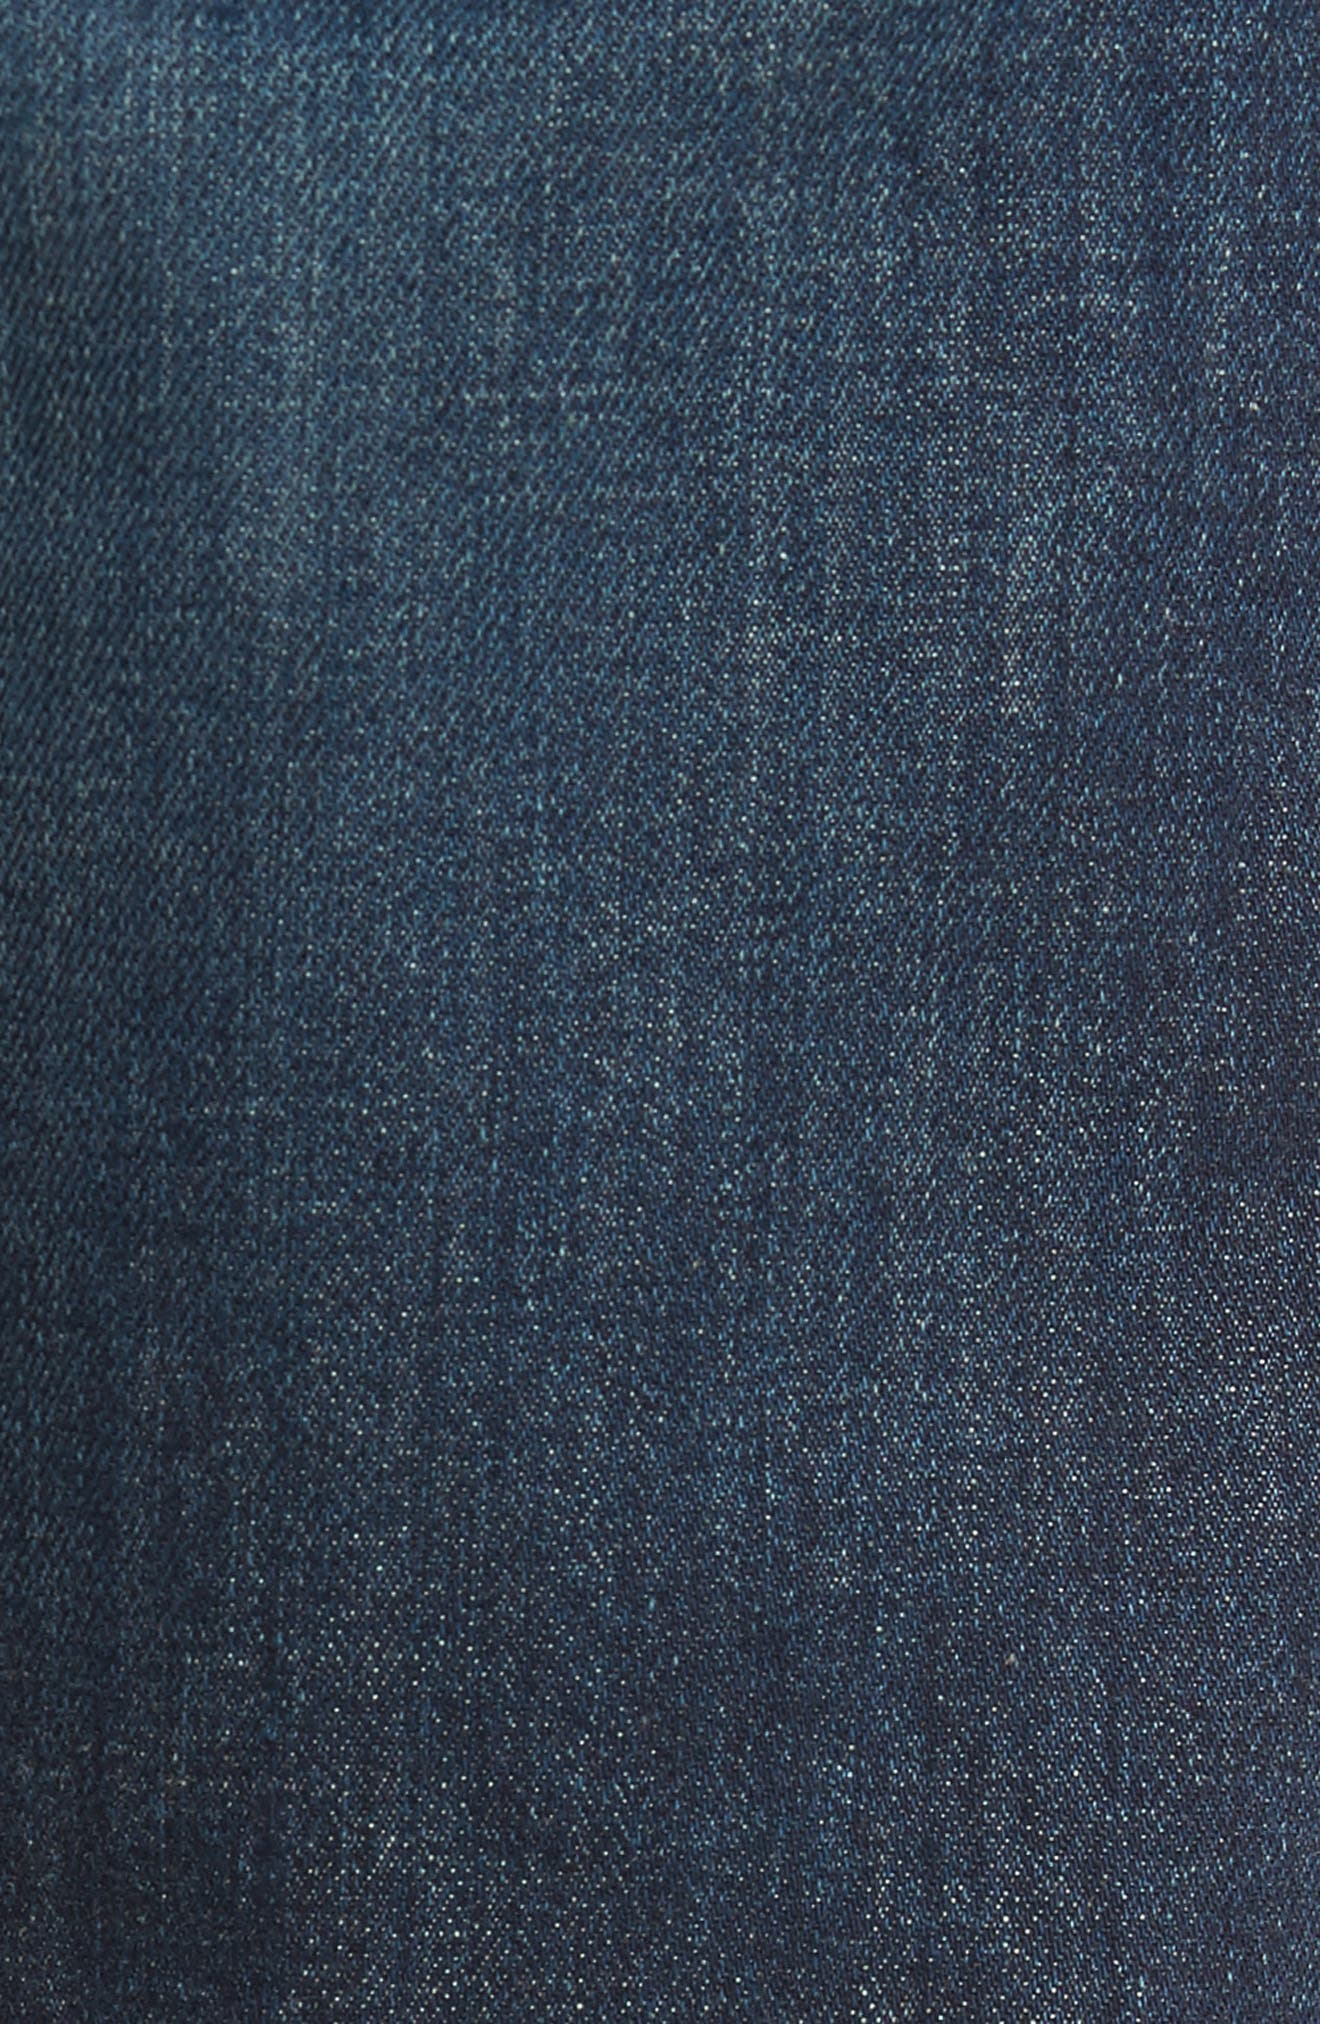 RAG & BONE,                             Fit 1 Skinny Fit Jeans,                             Alternate thumbnail 5, color,                             420